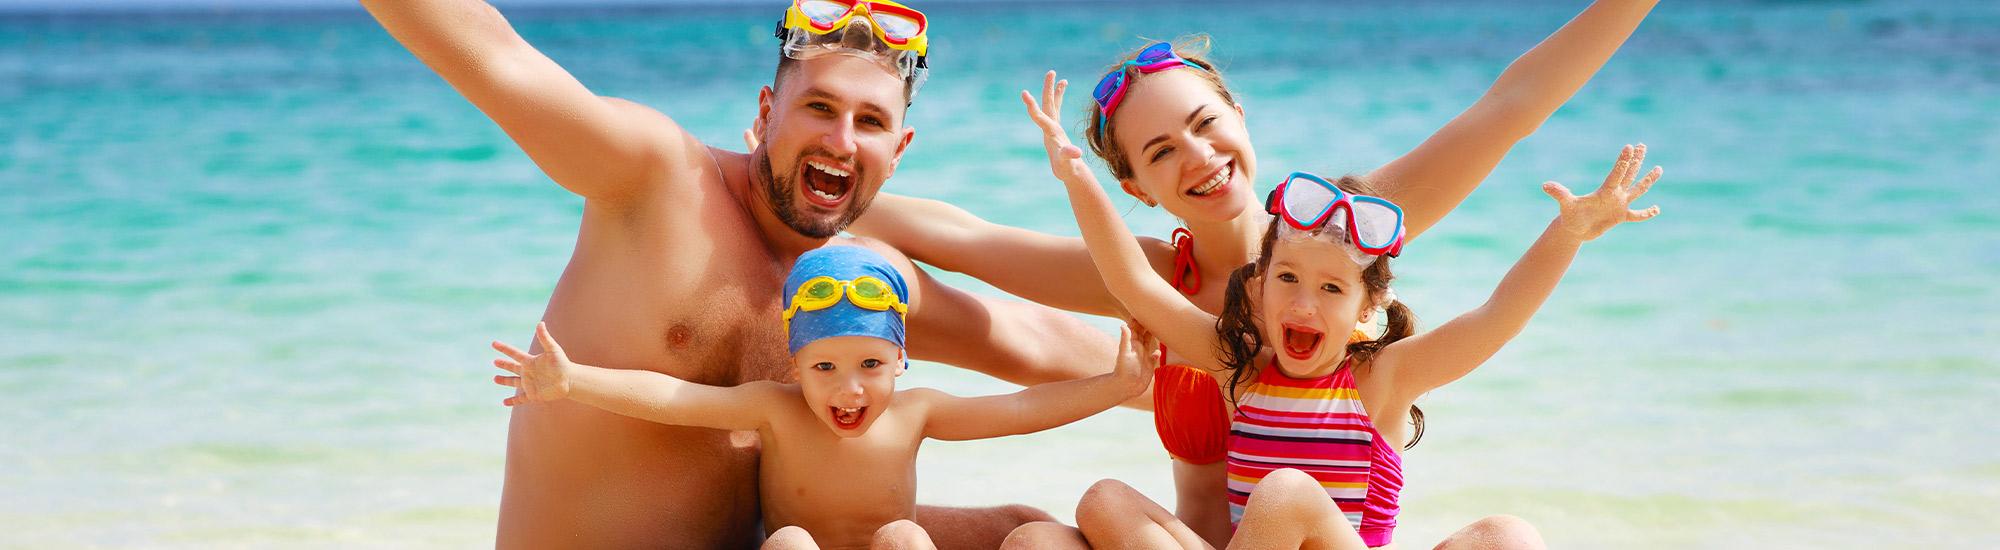 Contact Sun N Sand Resort